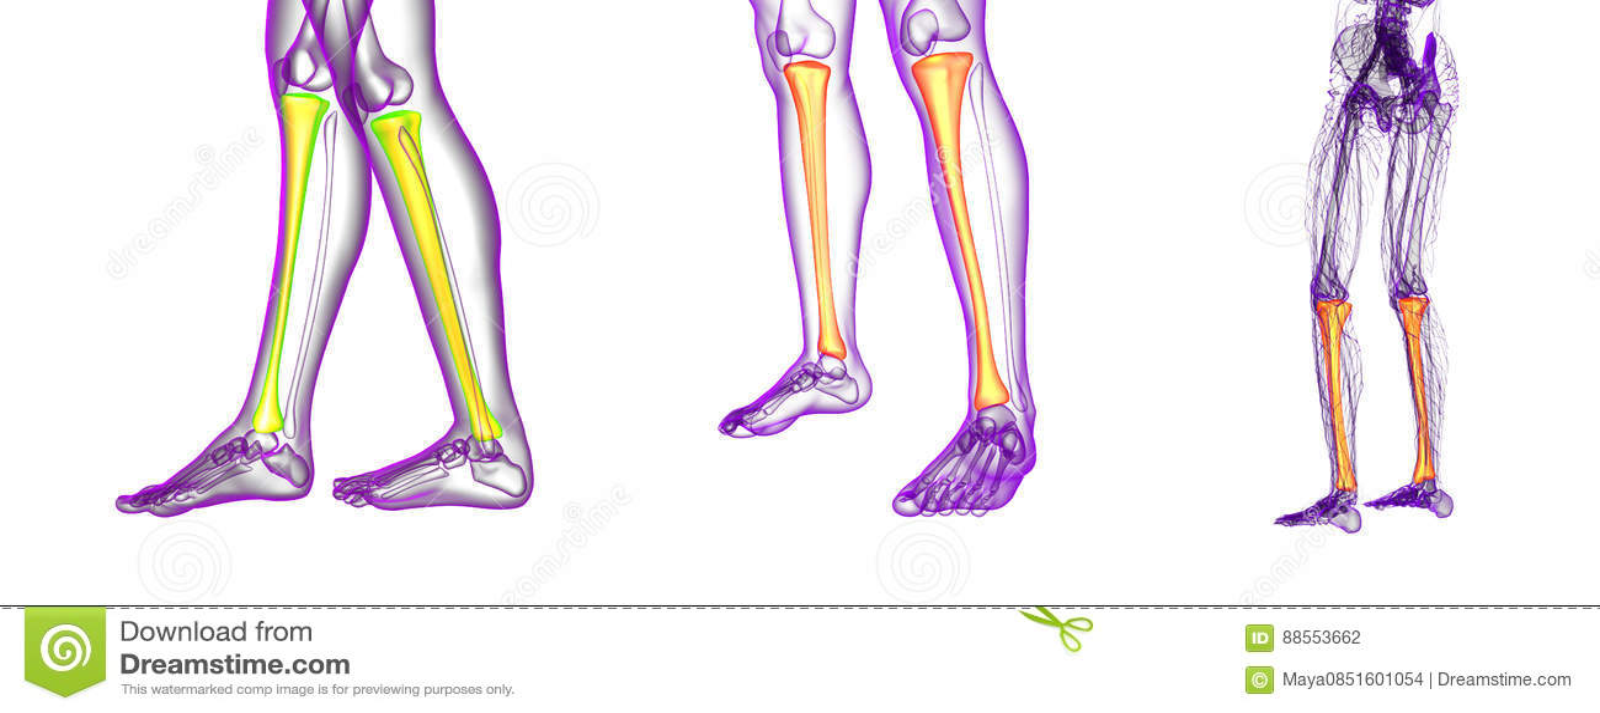 Tibia bone stock illustration. Illustration of human - 88553662